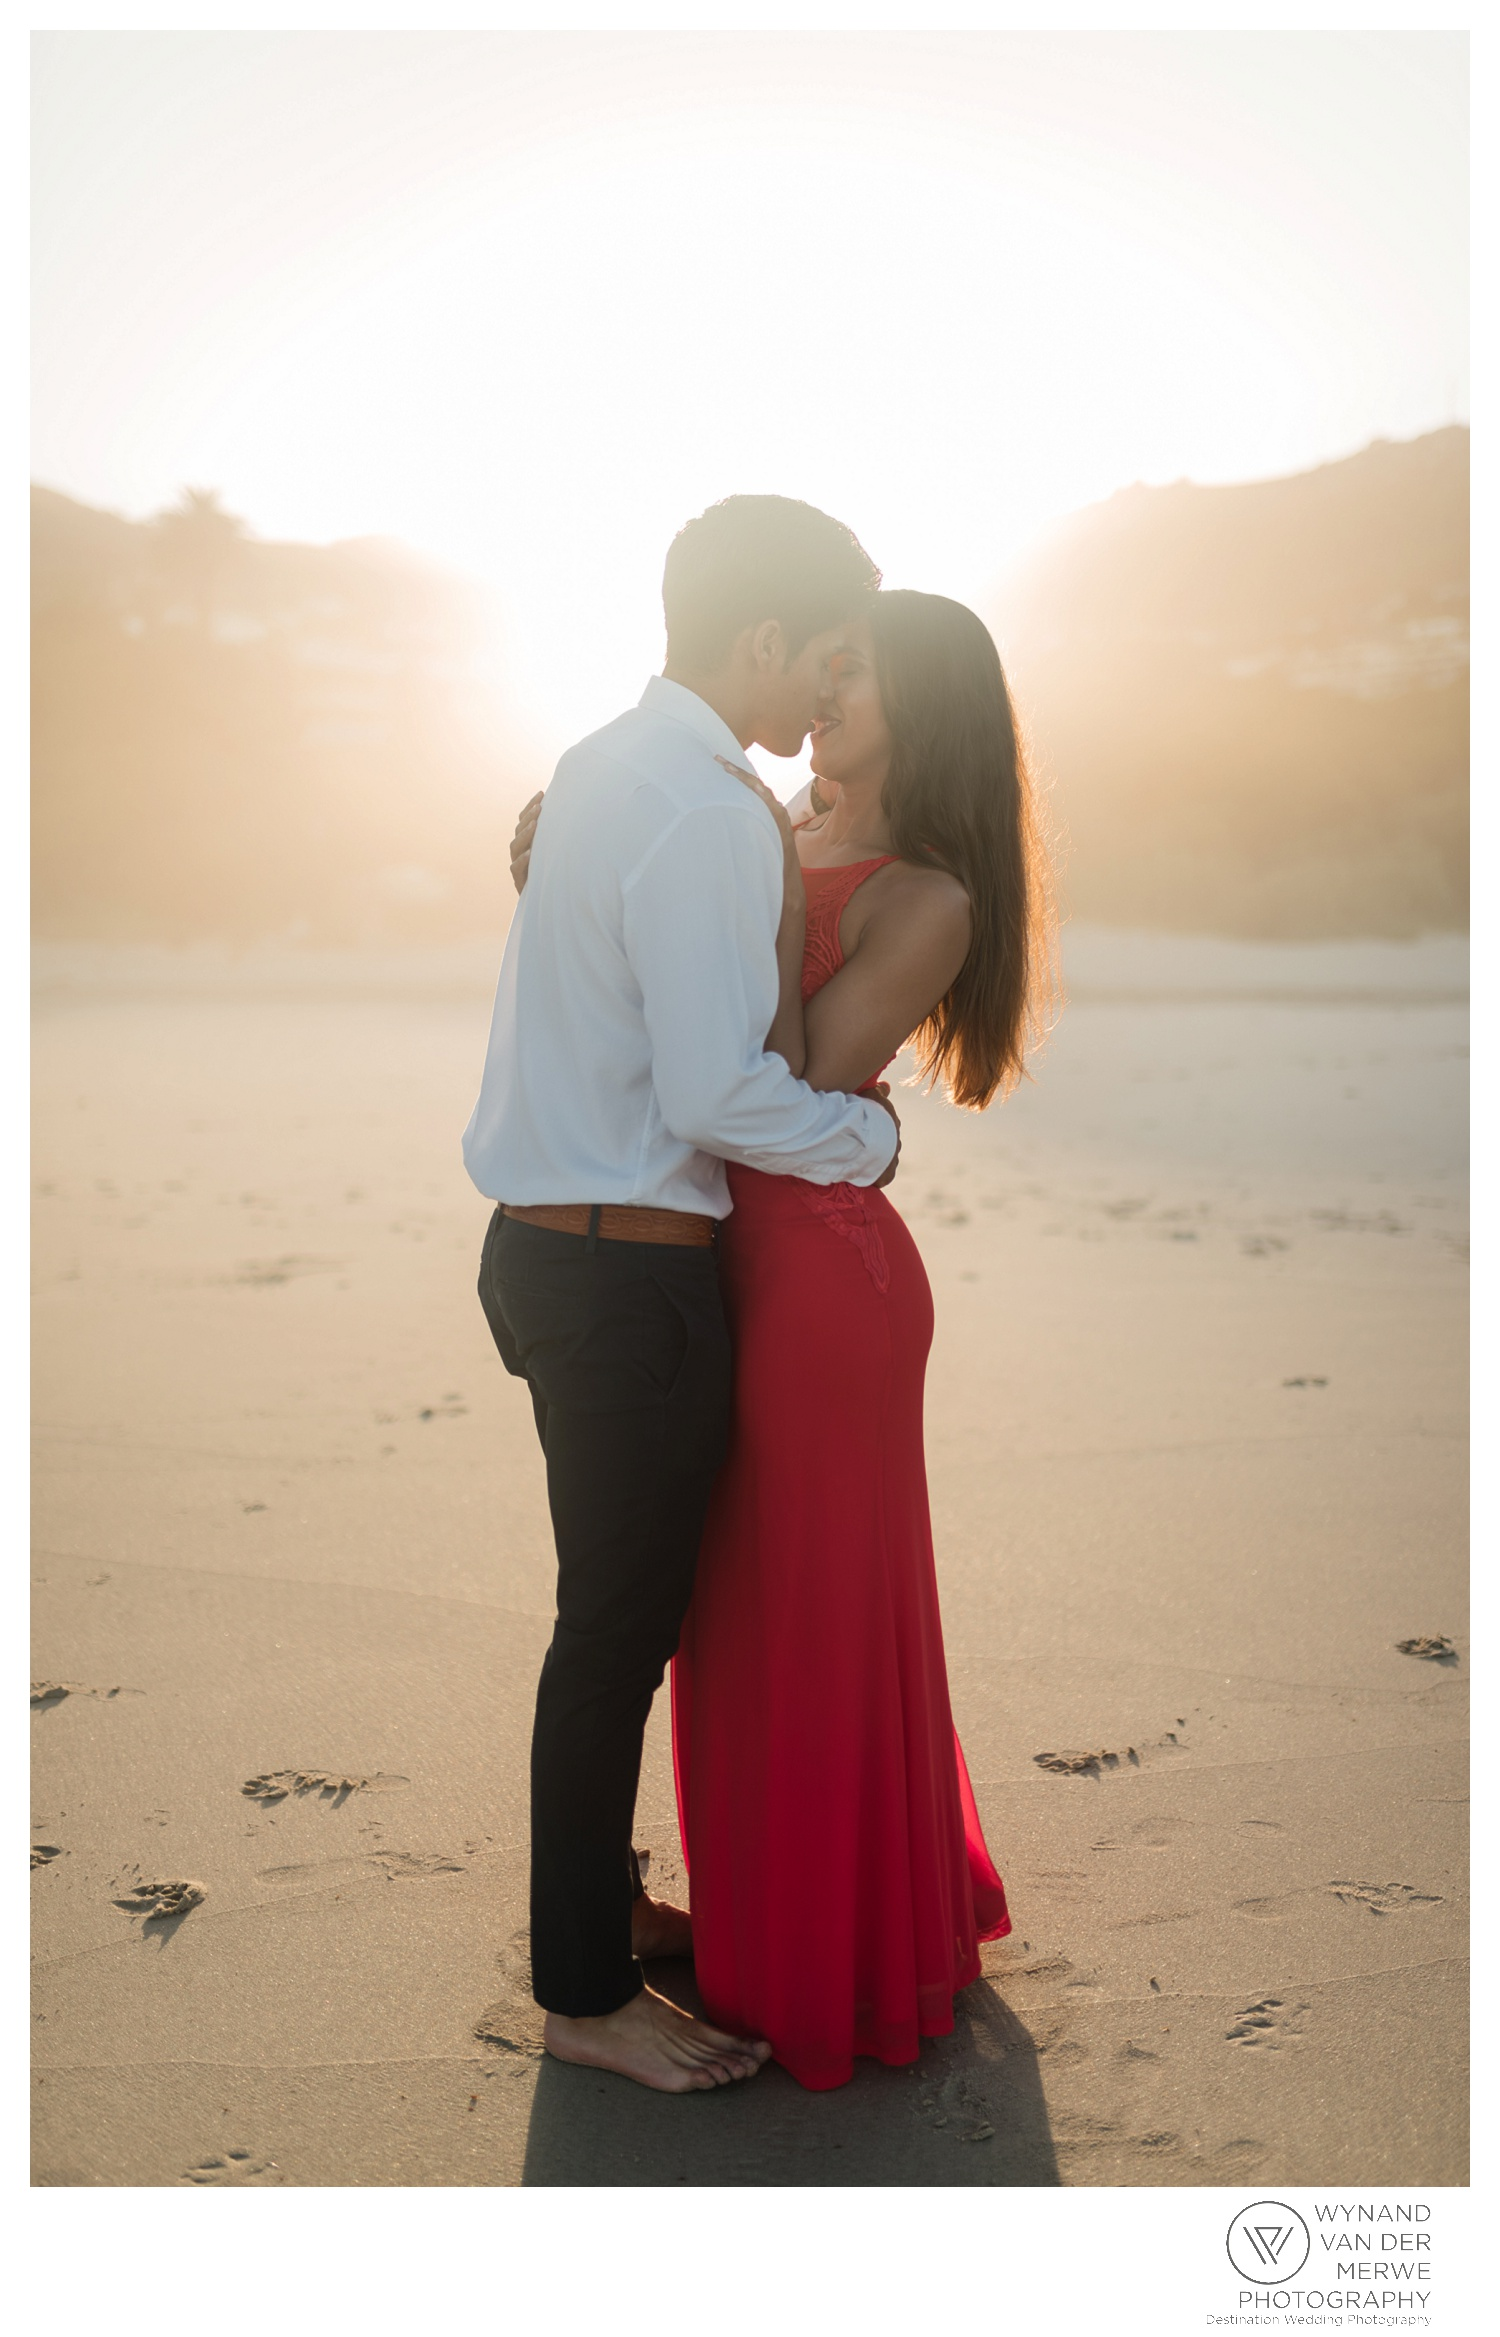 WvdM_engagementshoot_engaged_couple_prewedding_llandudno_cliftonbeach_beach_formal_southafrica_weddingphotographer_greernicolas-39.jpg